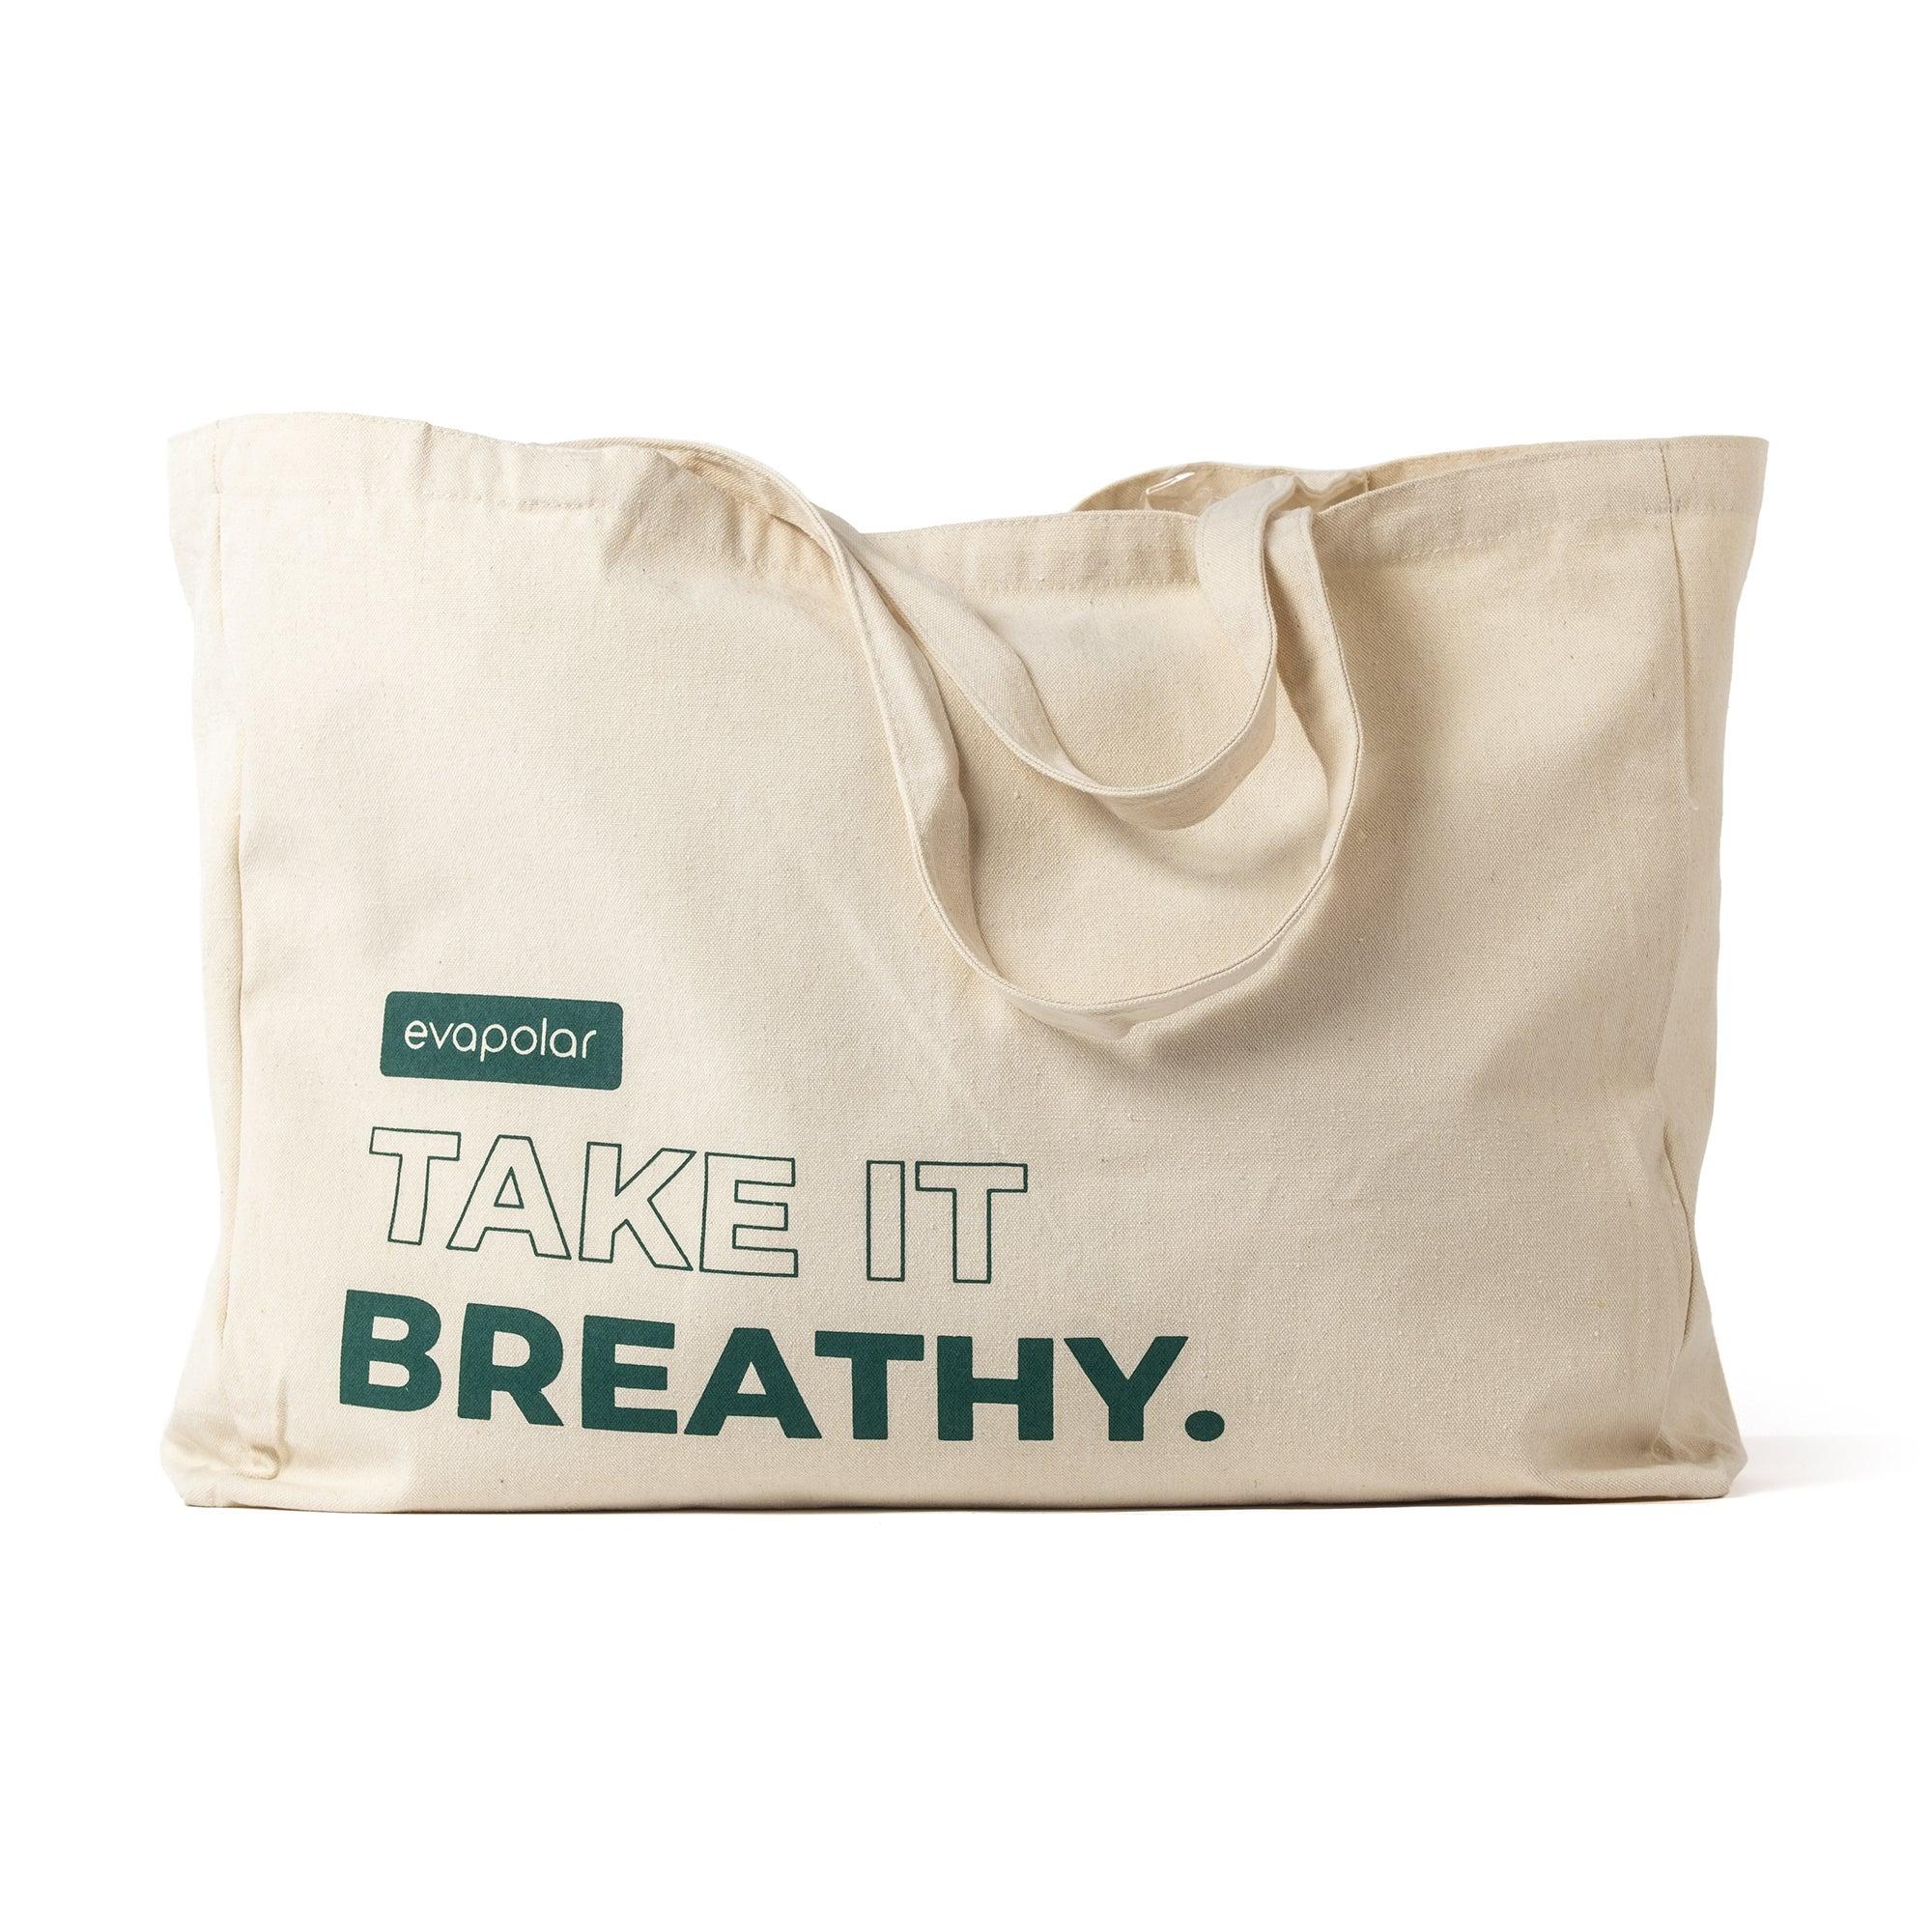 Evapolar evaBAG Cotton Tote Bag, Reusable Grocery Shopping Bag, Handy Bag, Ivory